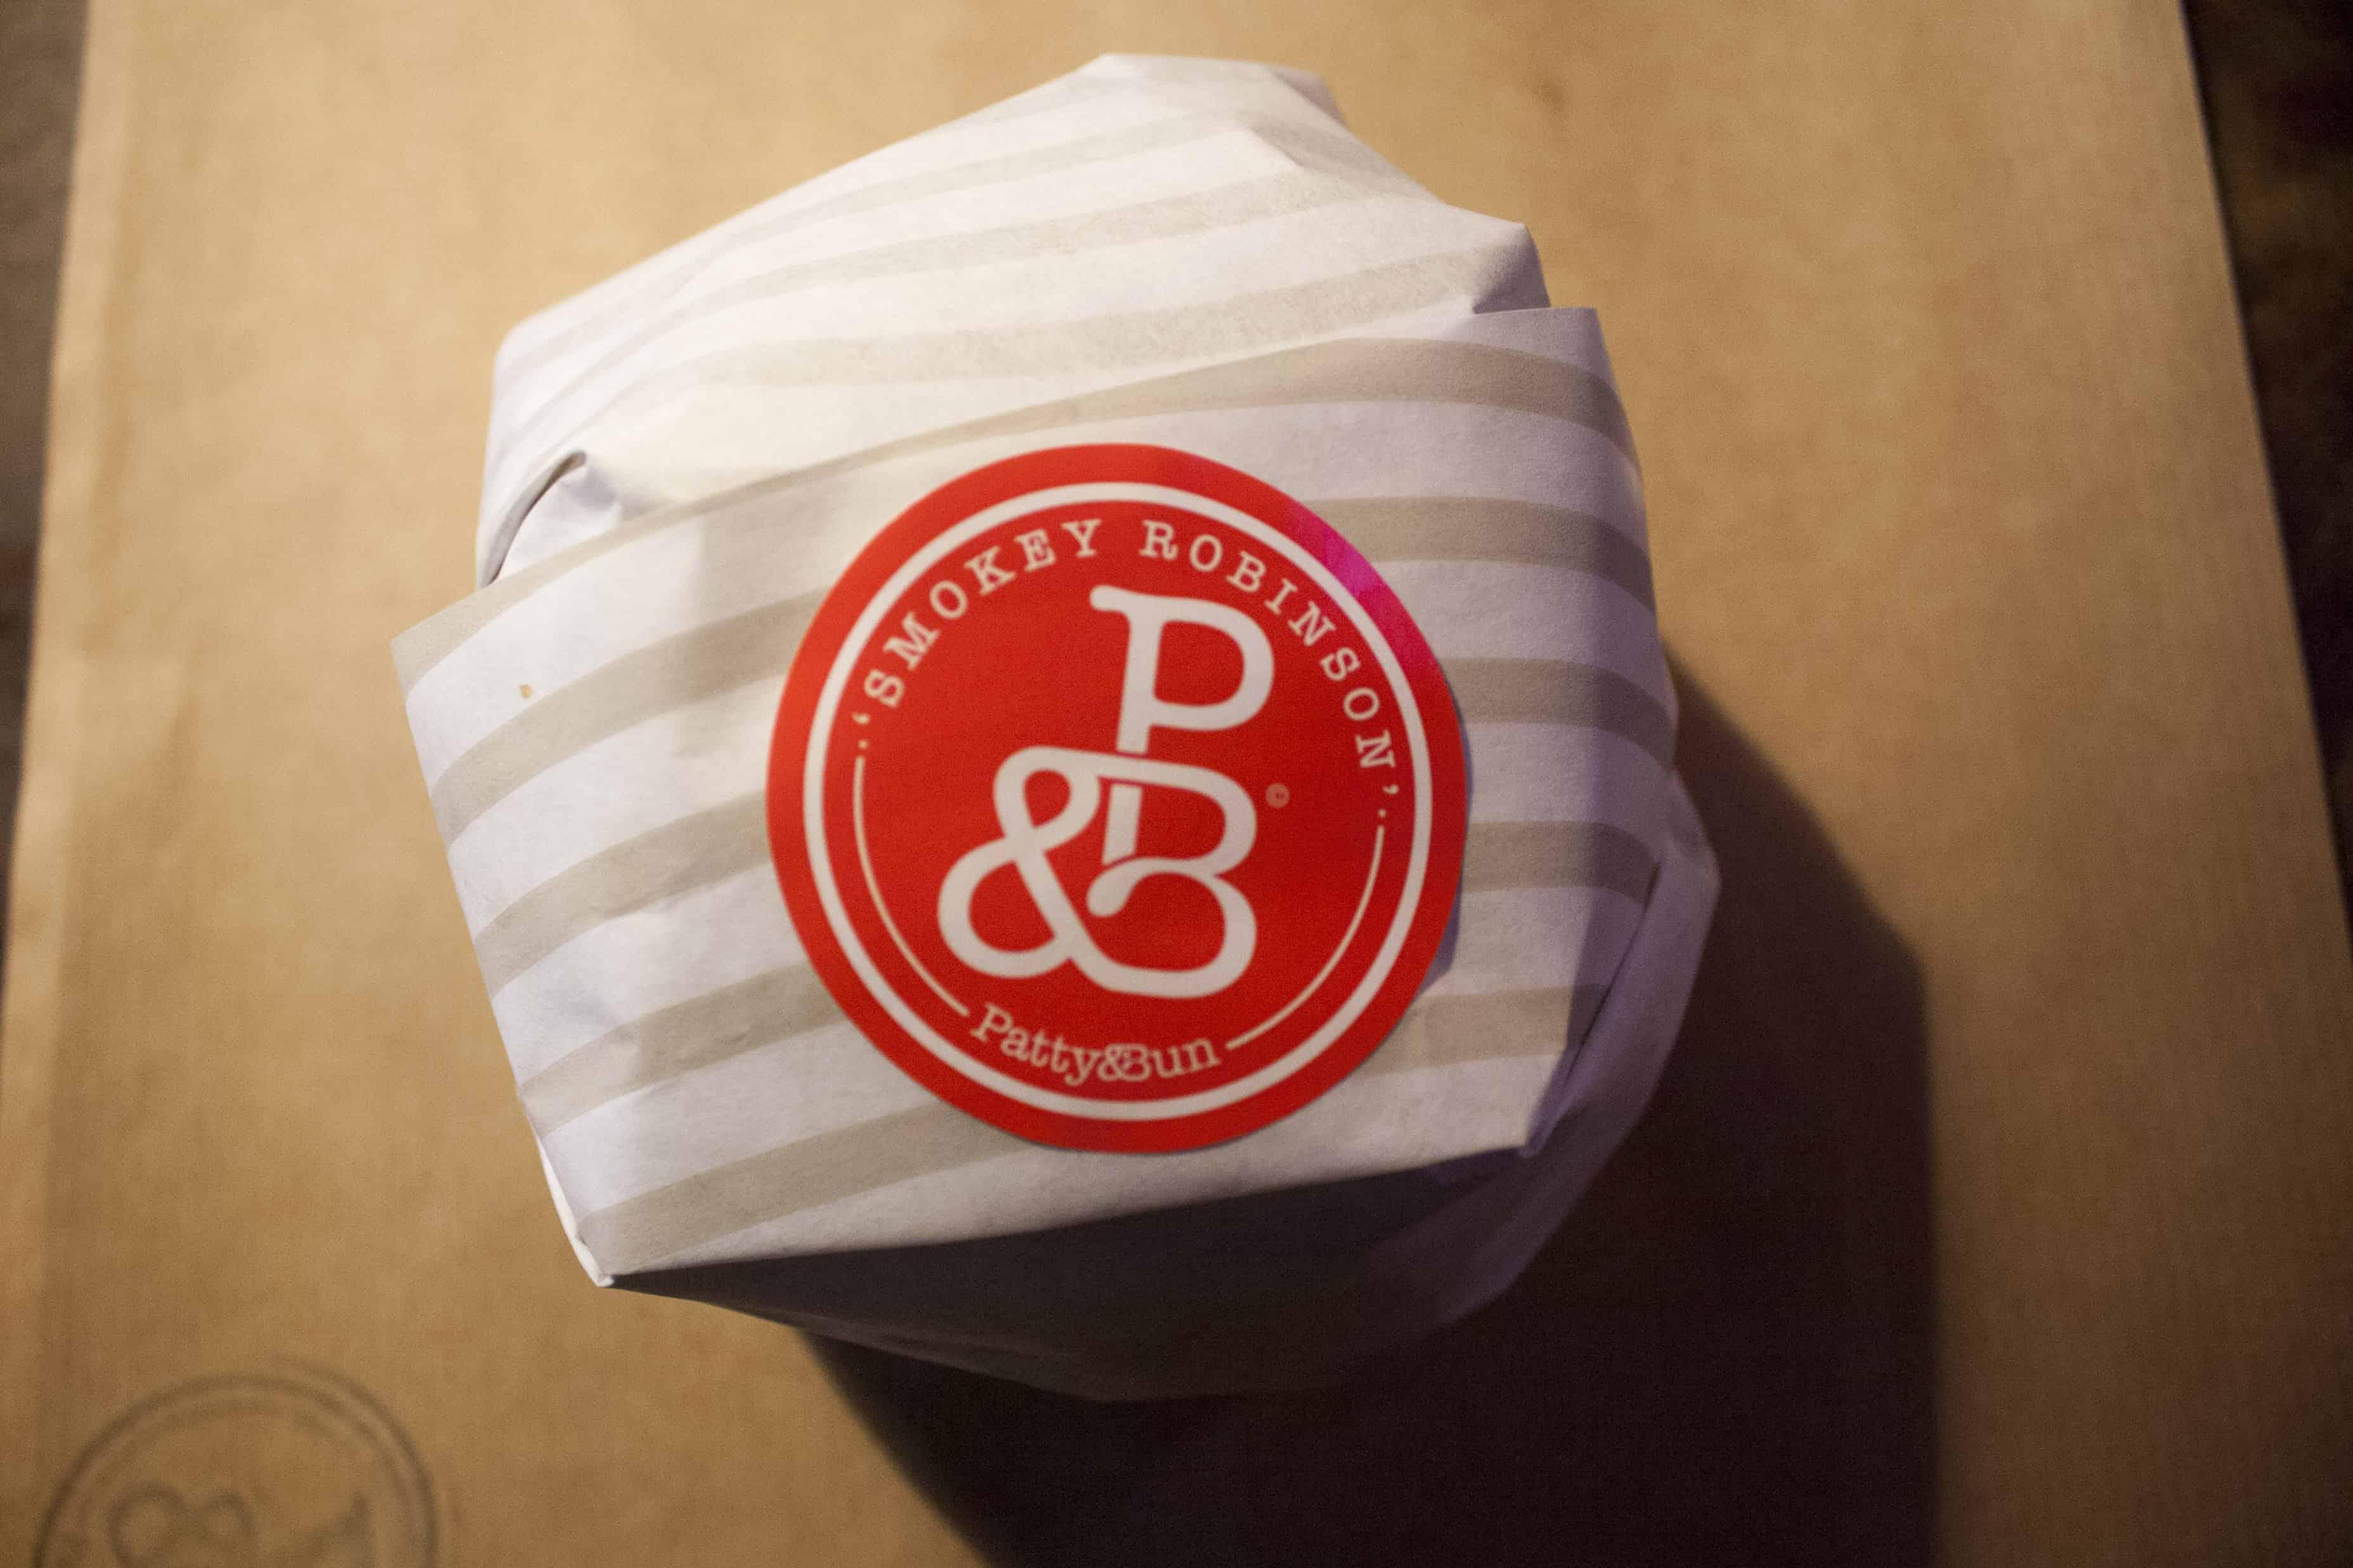 Patty and Bun Smokey Robinson Burger wrapped